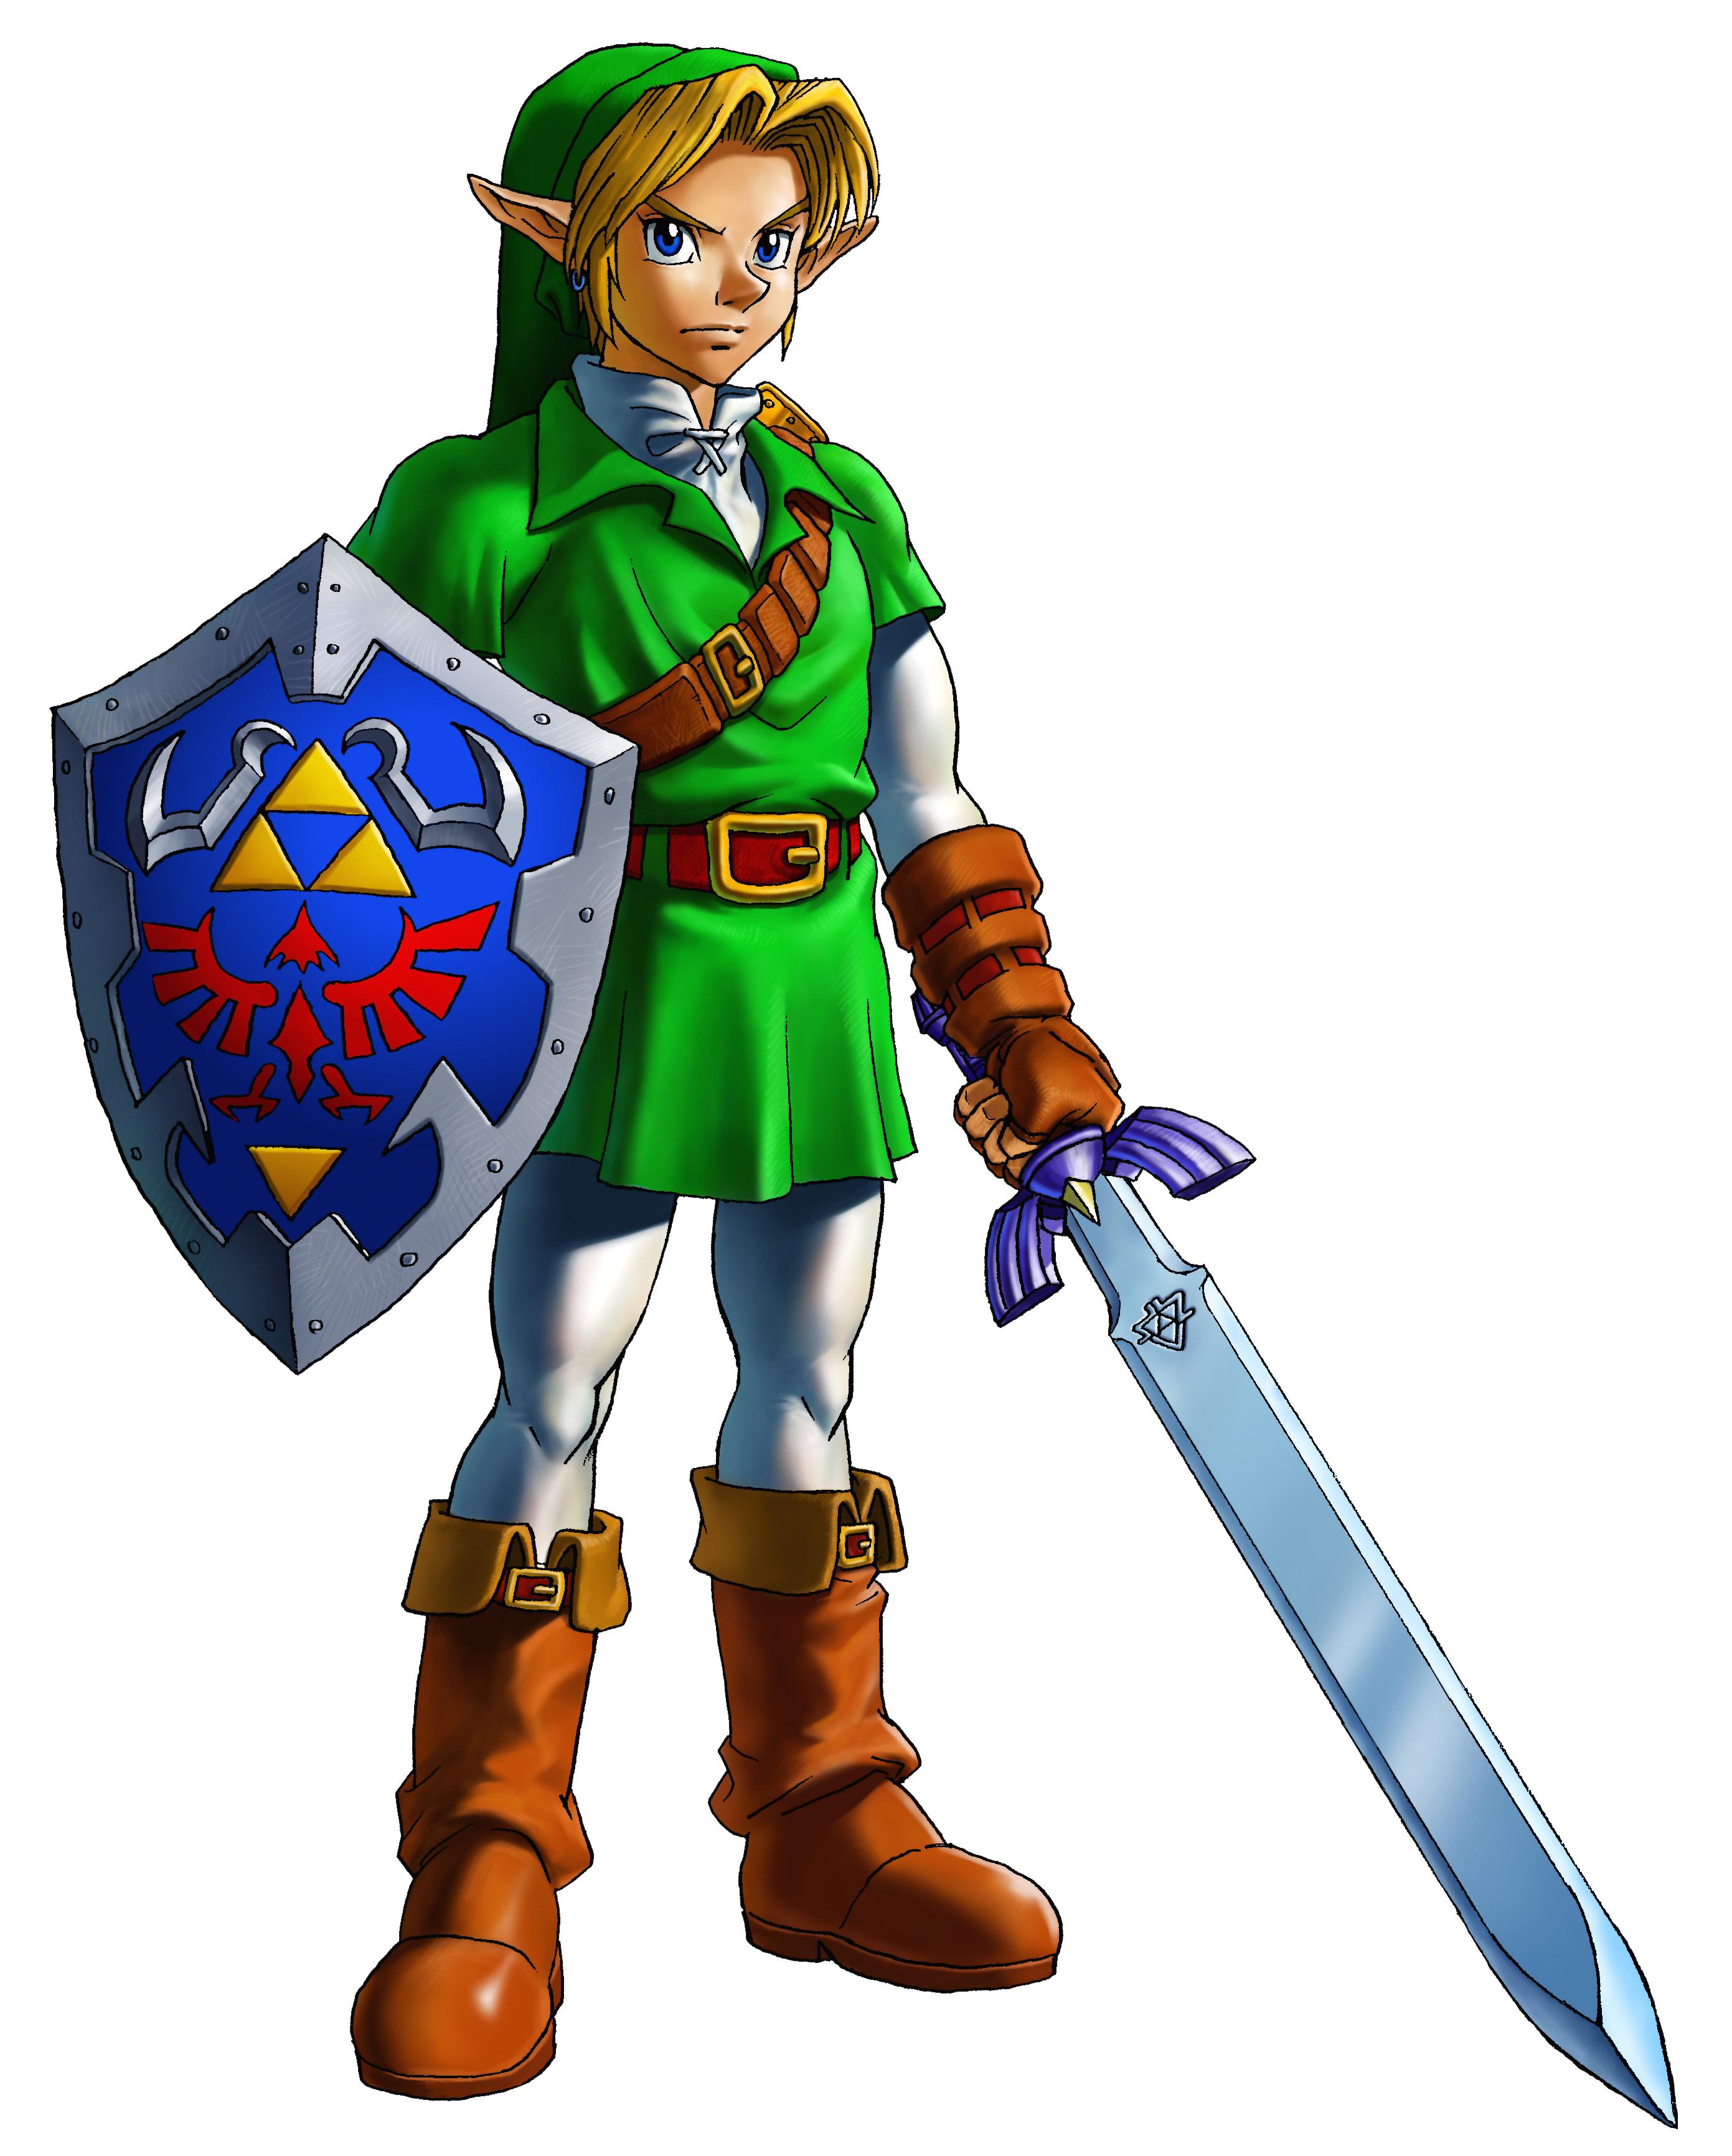 Link aqui